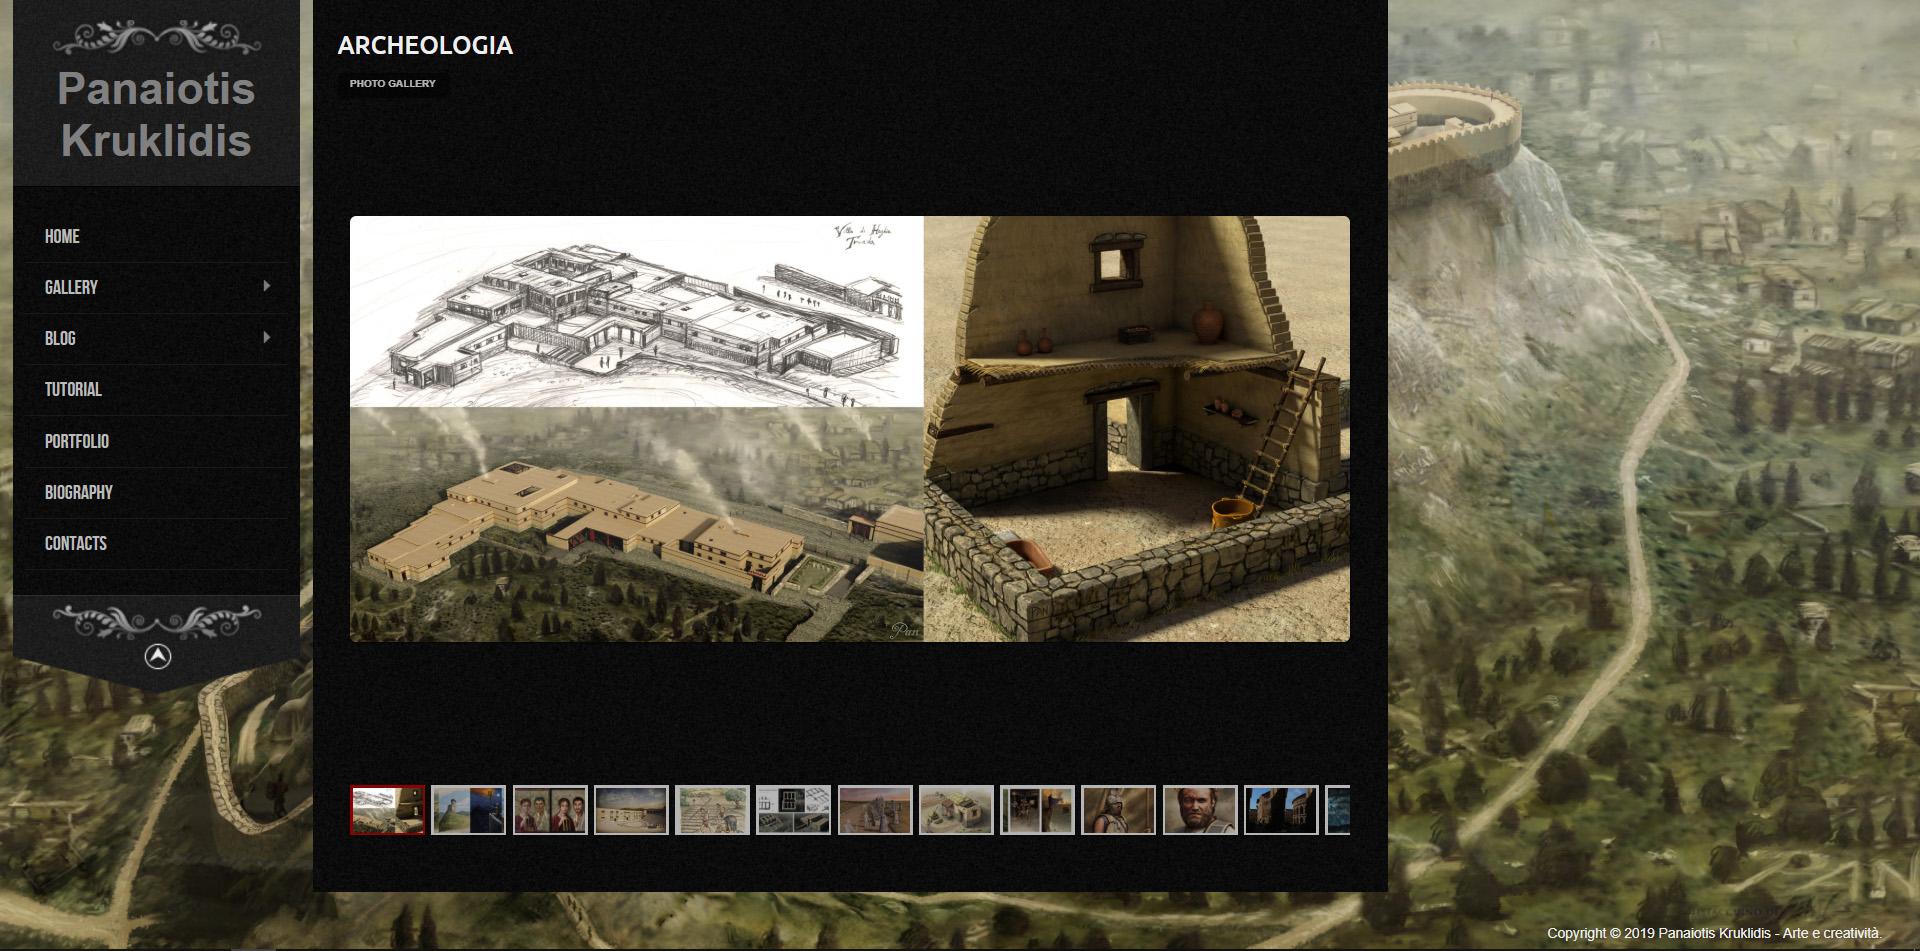 Panaiotis Kruklidis, illustratore, architetto, portfolio, grafica, ricostruzioni